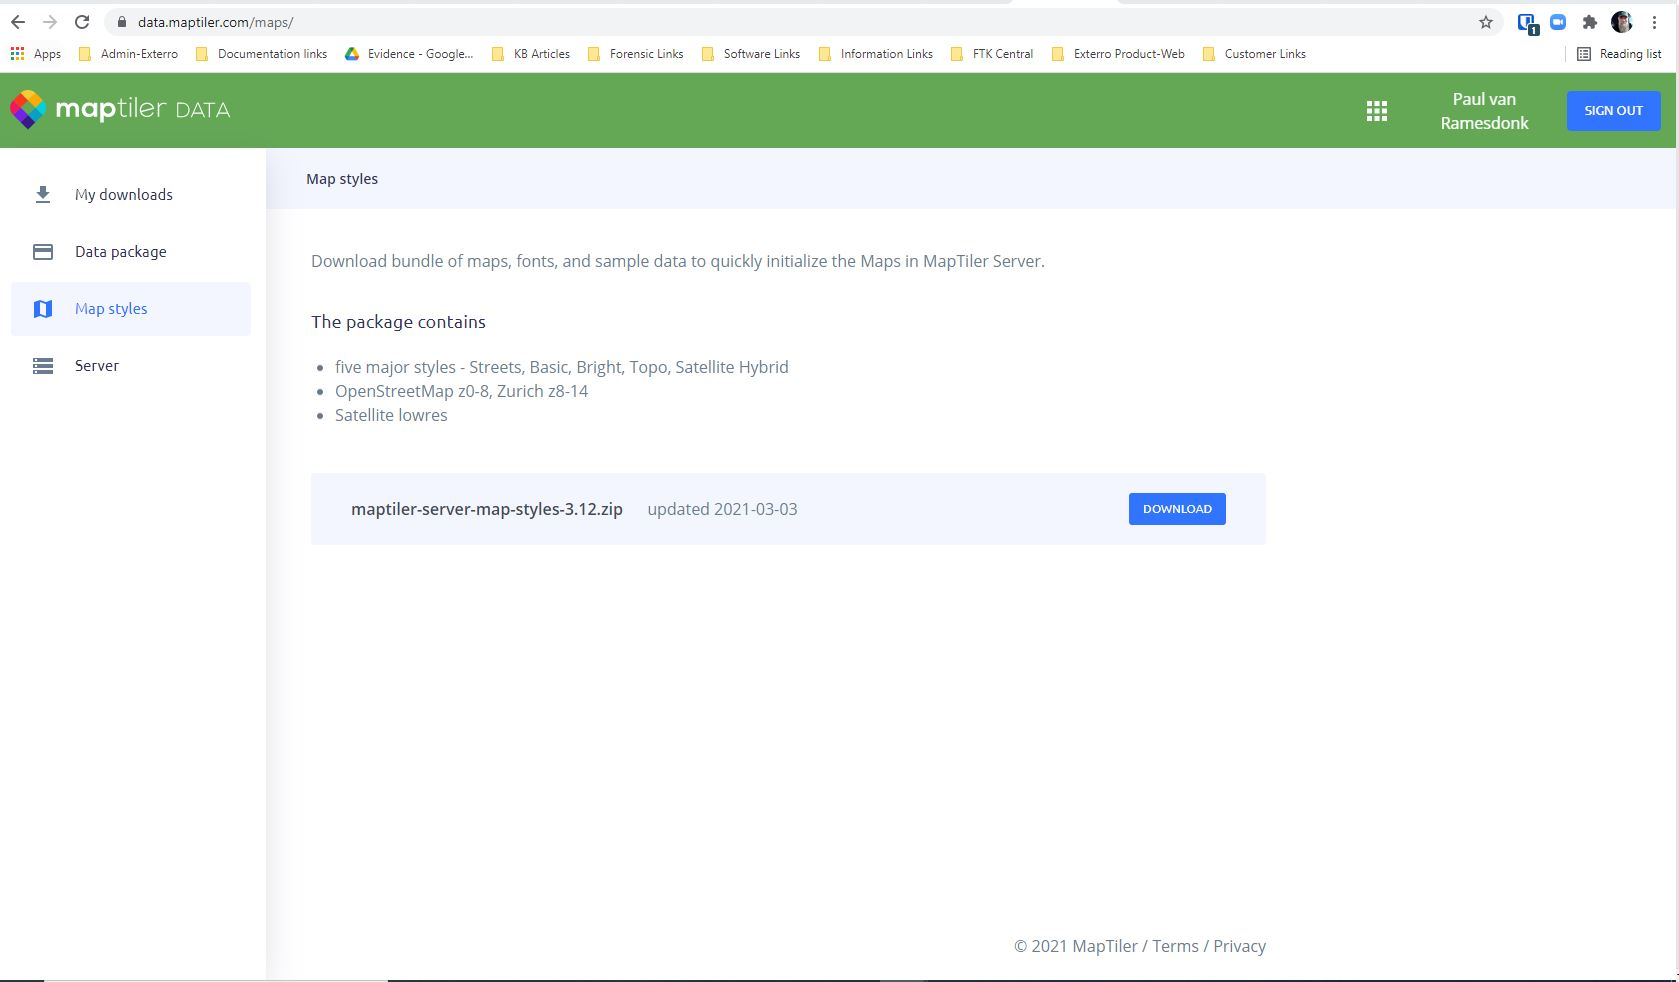 https://s3.amazonaws.com/cdn.freshdesk.com/data/helpdesk/attachments/production/69009875534/original/Styles.JPG?X-Amz-Algorithm=AWS4-HMAC-SHA256&X-Amz-Credential=AKIAS6FNSMY2XLZULJPI%2F20210926%2Fus-east-1%2Fs3%2Faws4_request&X-Amz-Date=20210926T163817Z&X-Amz-Expires=300&X-Amz-SignedHeaders=host&X-Amz-Signature=66452c81bfe8f526d44feaa98f229f3cfea22551df12500bb36a6e740296db48